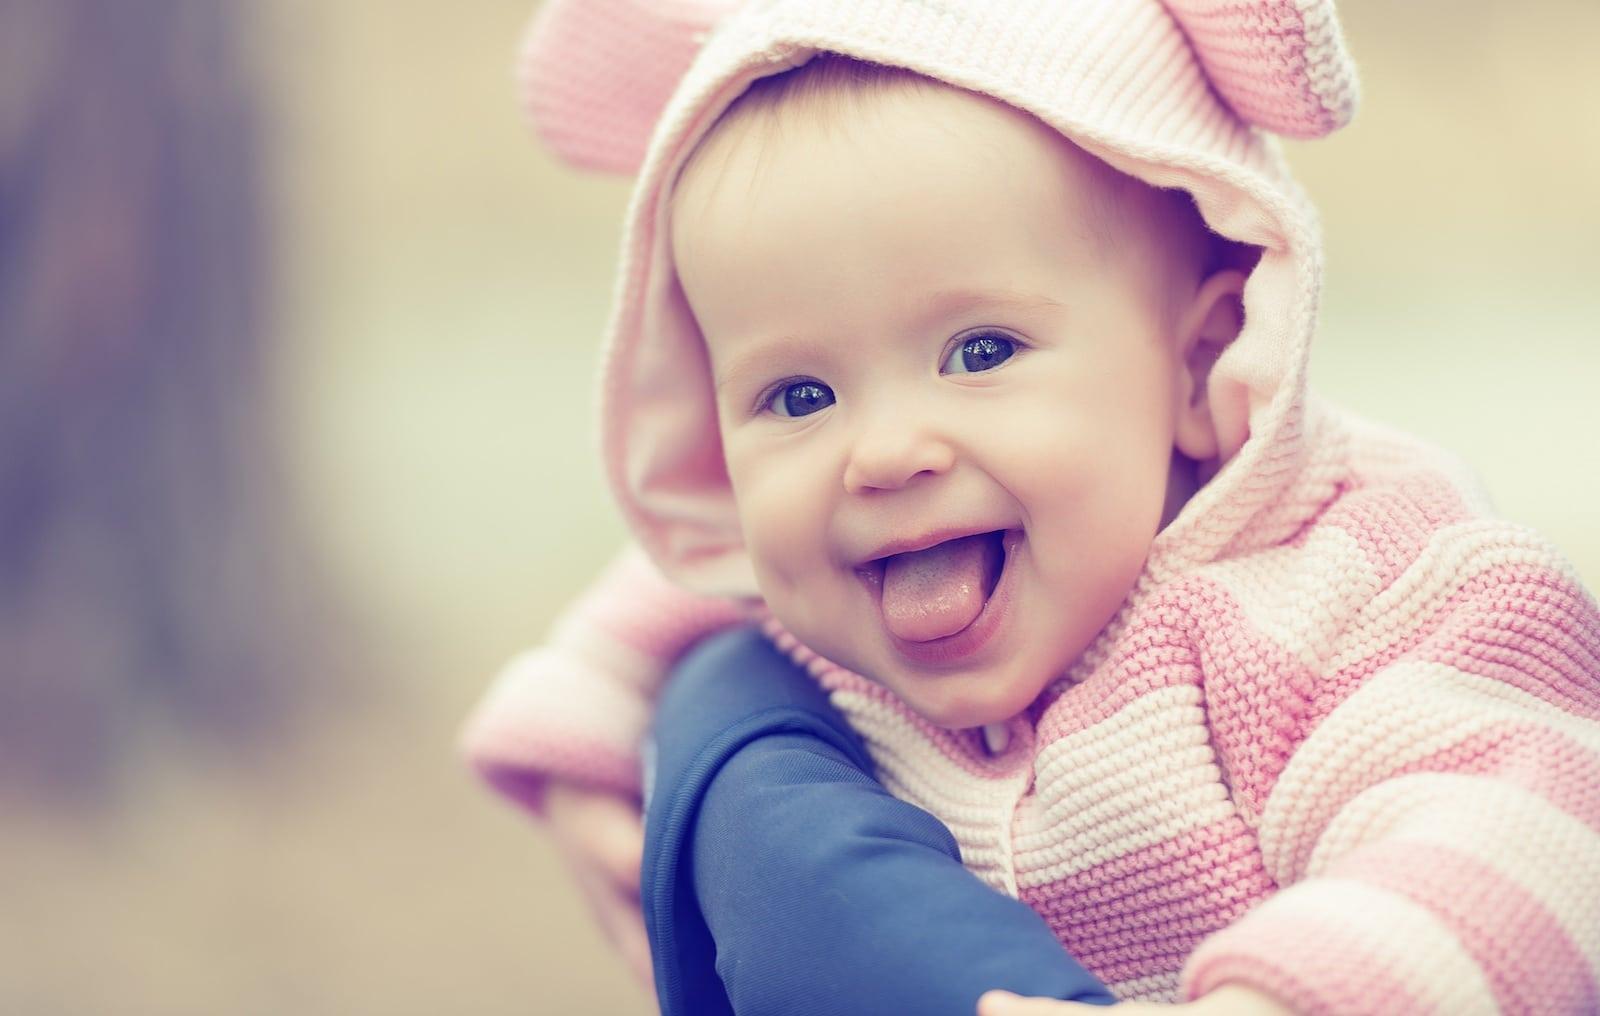 5 lucruri despre bebelusi care te trezesc la realitate. Ce trebuie neaparat sa stii inainte sa devii parinte